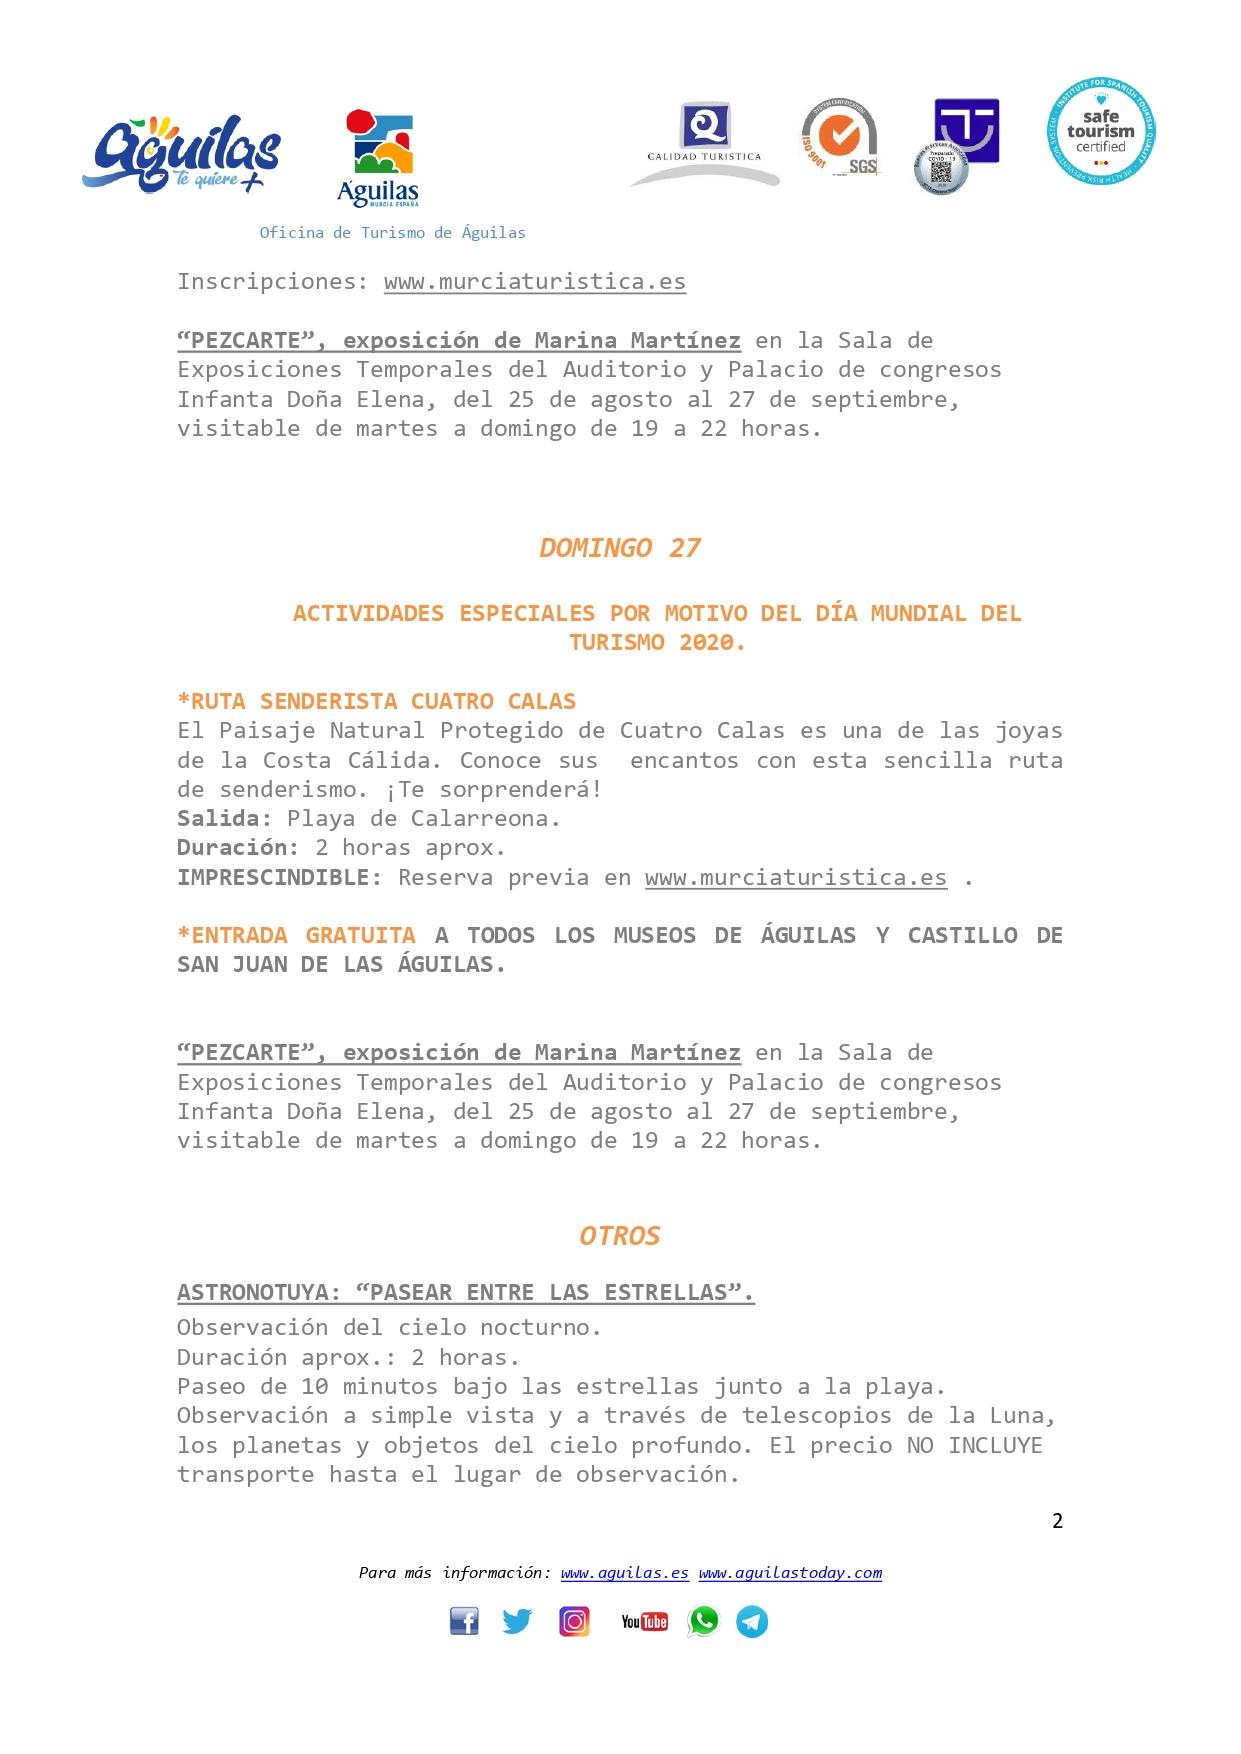 pdf_page-0002.jpg